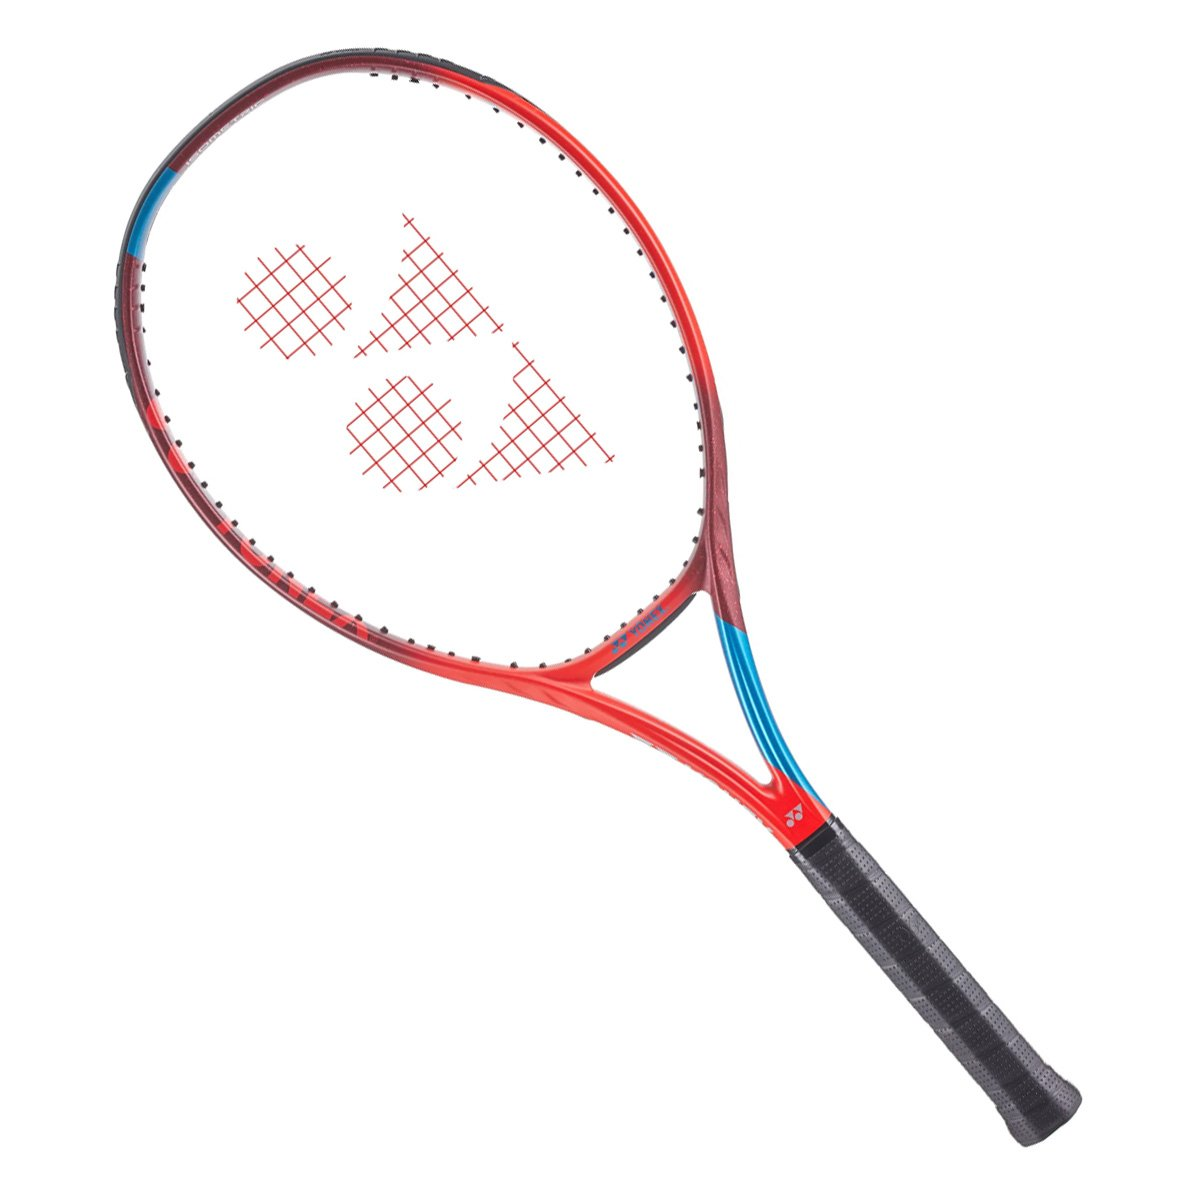 Raquete de Tênis Yonex Vcore 100 - 300g